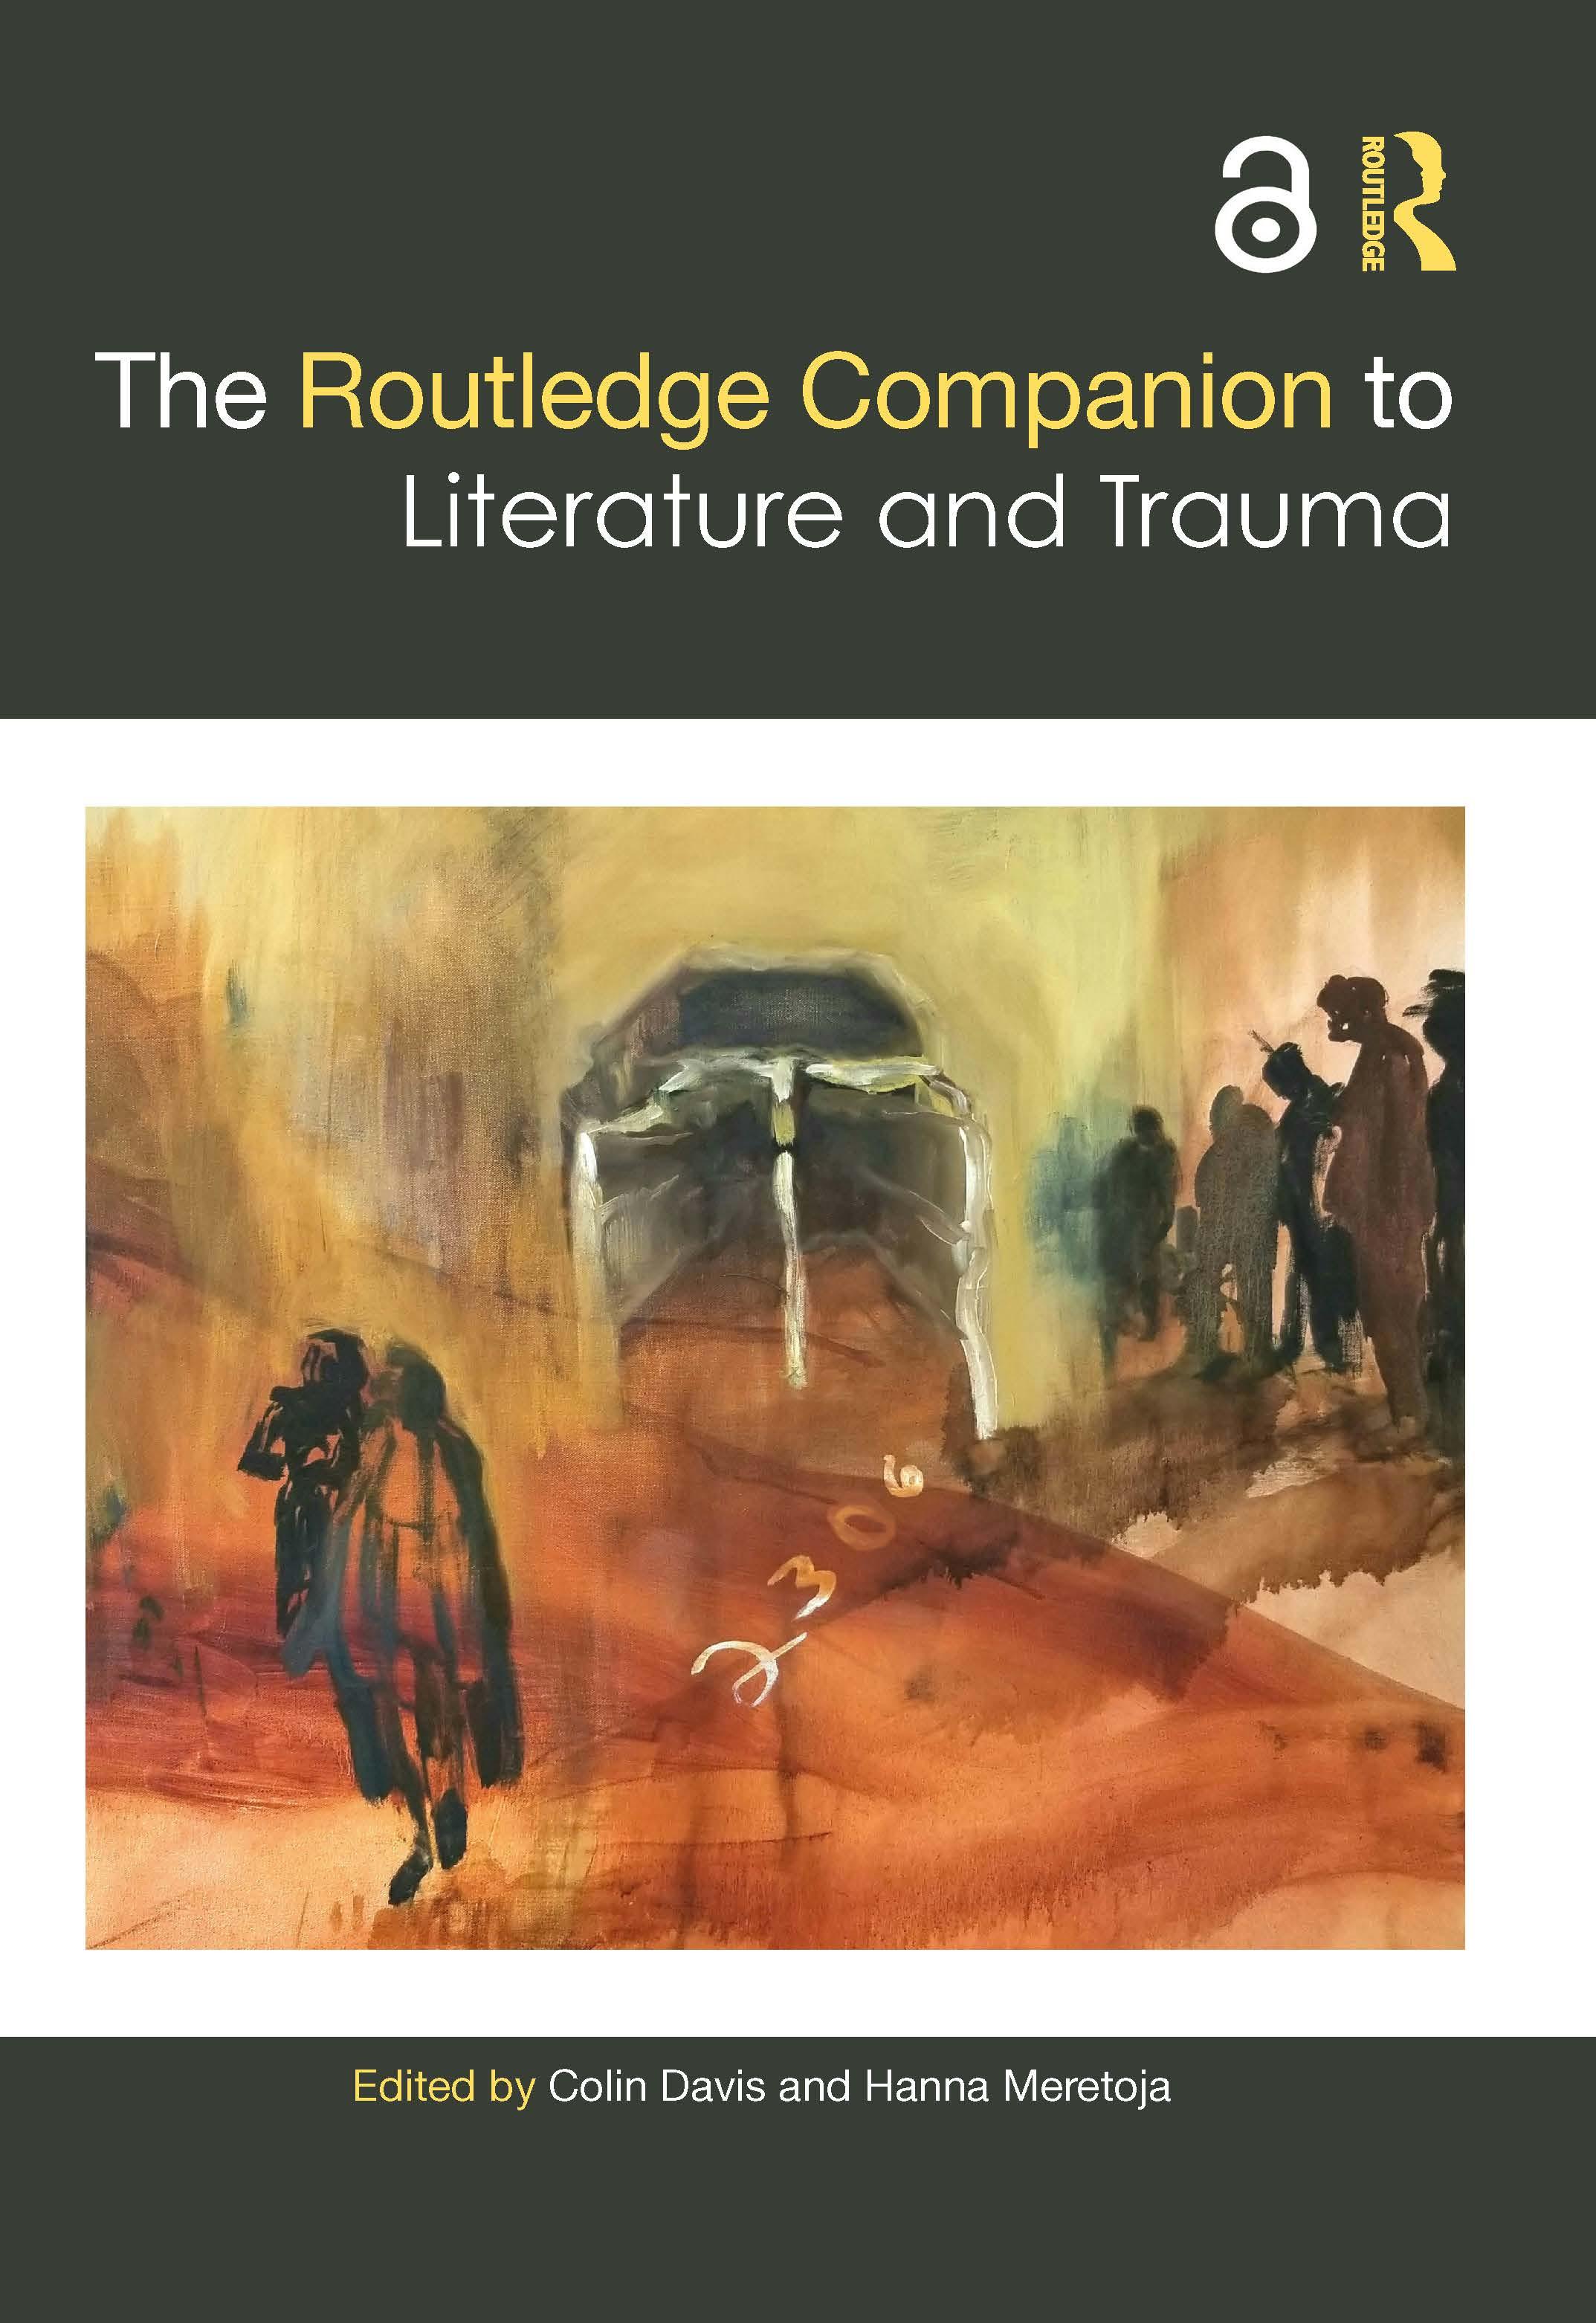 The Routledge Companion to Literature and Trauma book cover